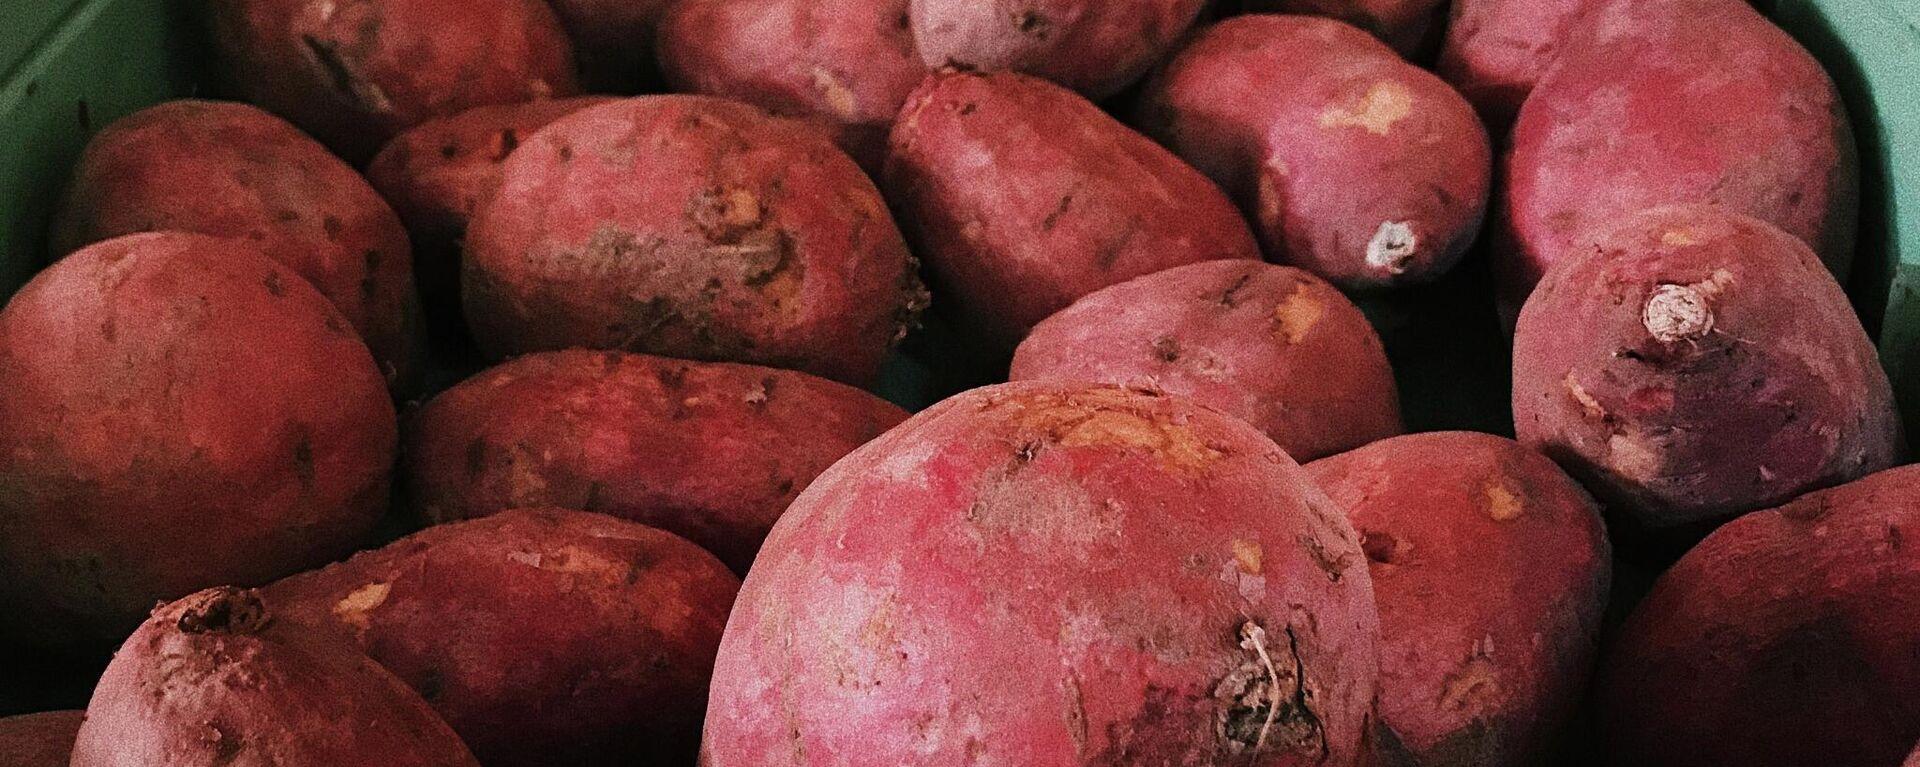 Unas batatas - Sputnik Mundo, 1920, 11.08.2021